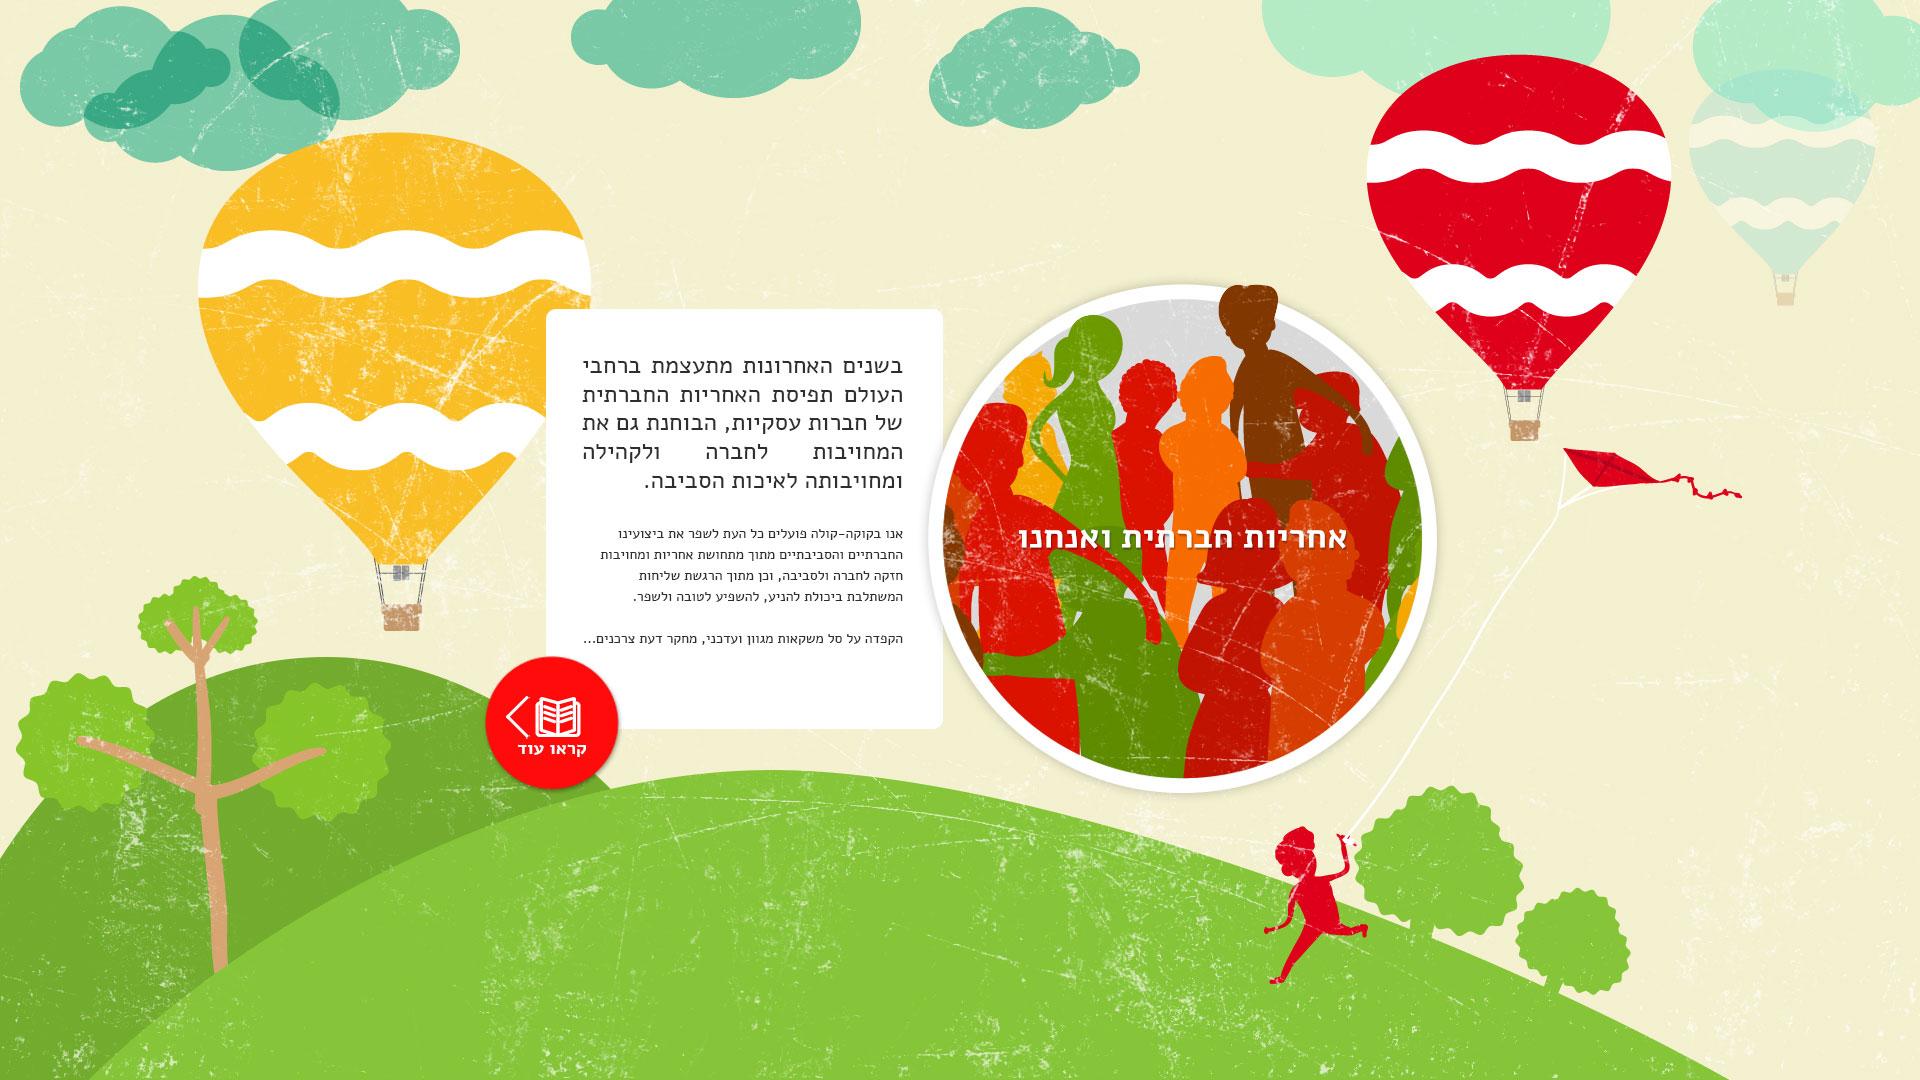 Coca Cola social responsibility website design קוקה קולה עיצוב אתר אחריות חברתית 7